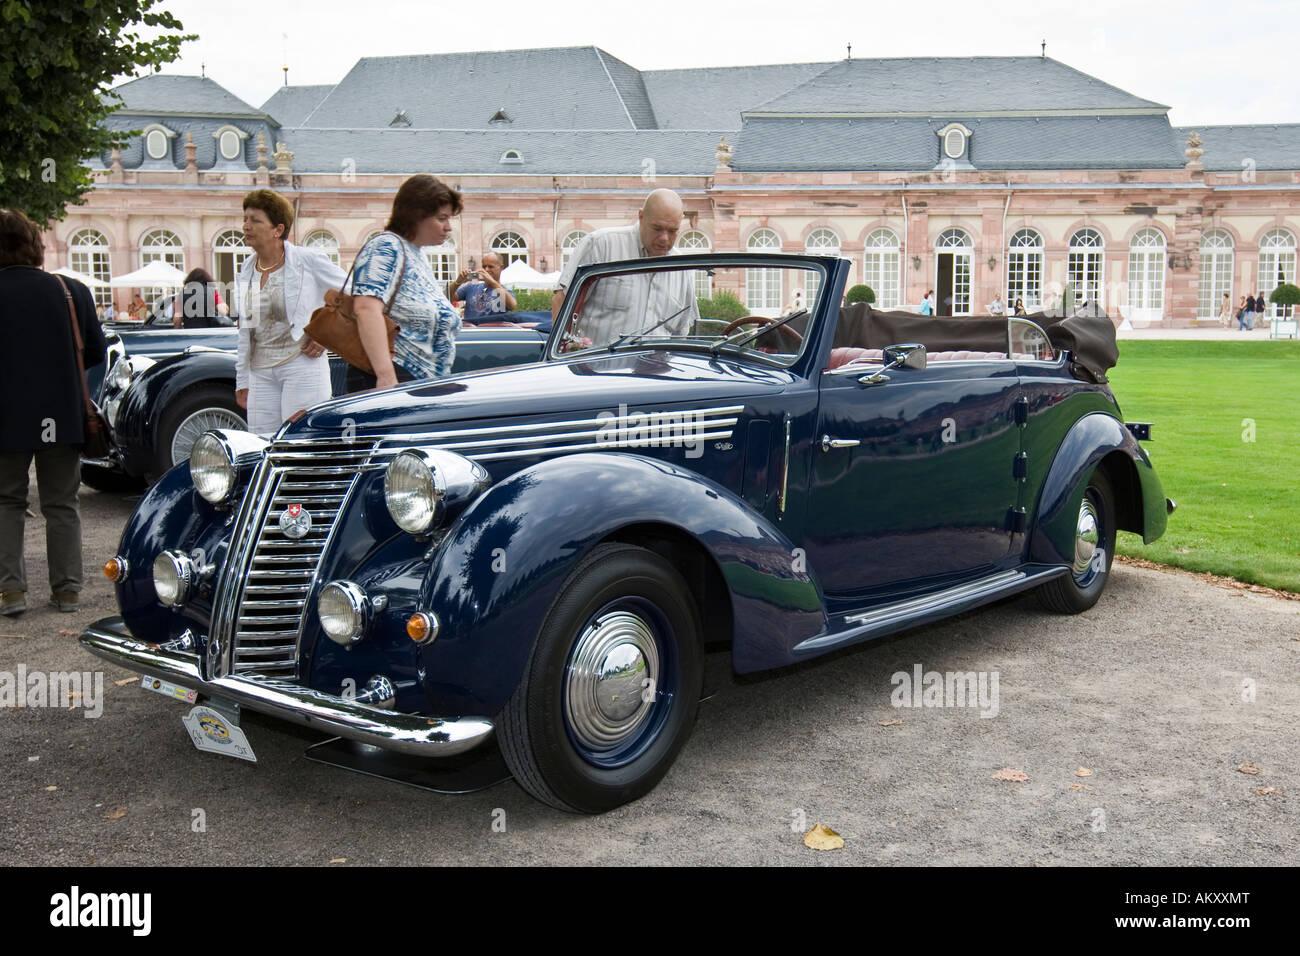 Fiat 1500 Viotti Convertible, I 1940 - 48, vintage car meeting, Schwetzingen, Baden-Wuerttemberg, Germany - Stock Image